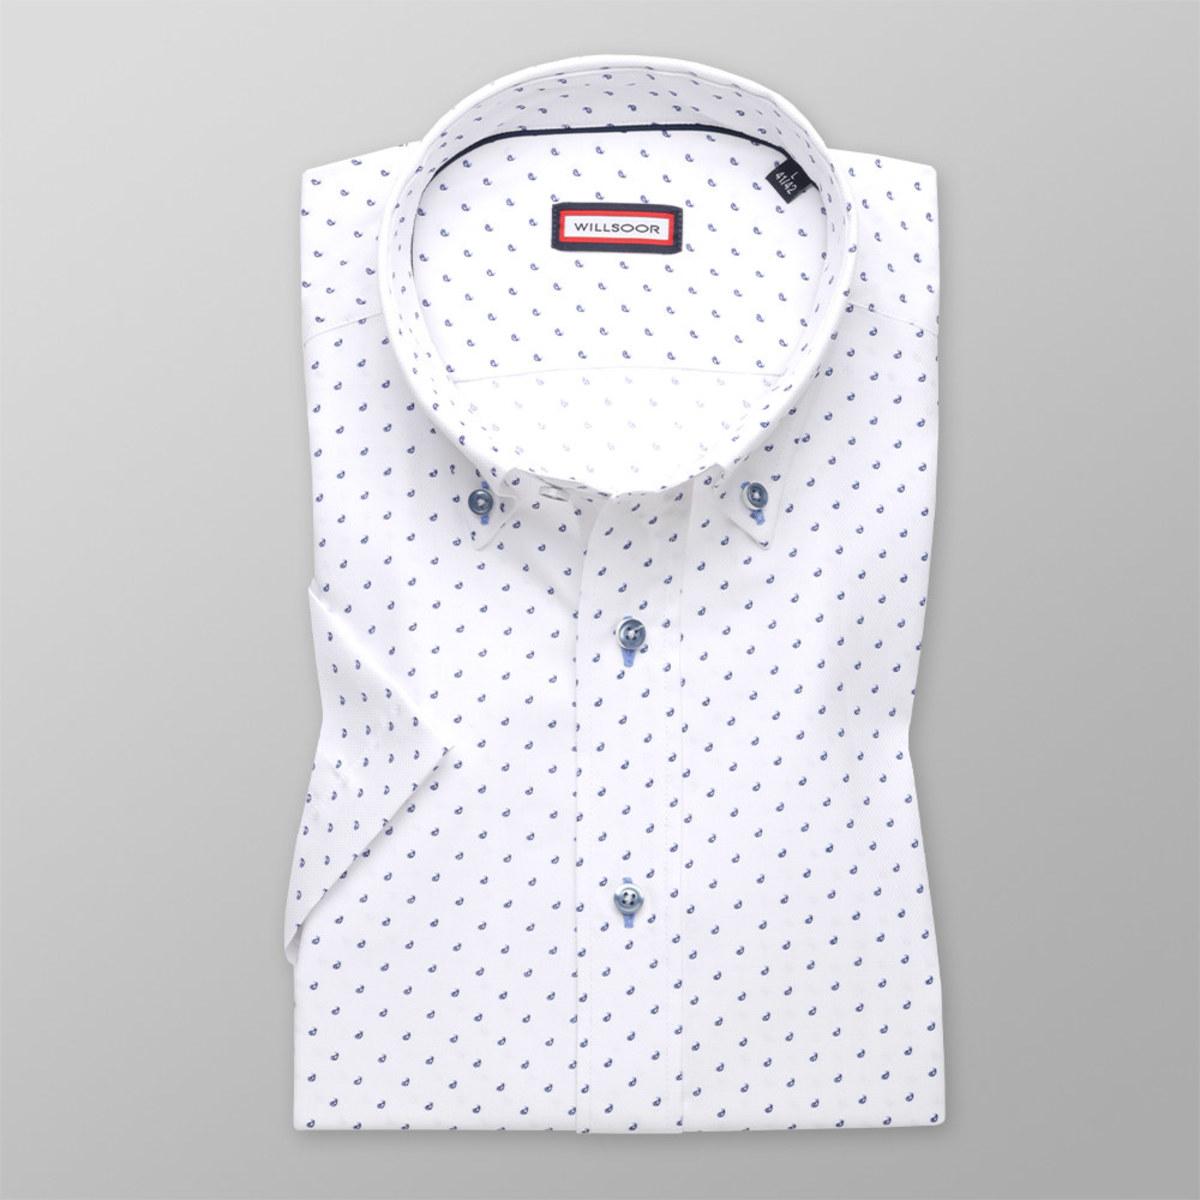 Košeľa Slim Fit so vzorom kvapiek (výška 176 - 182) 10587 176-182 / L (41/42)